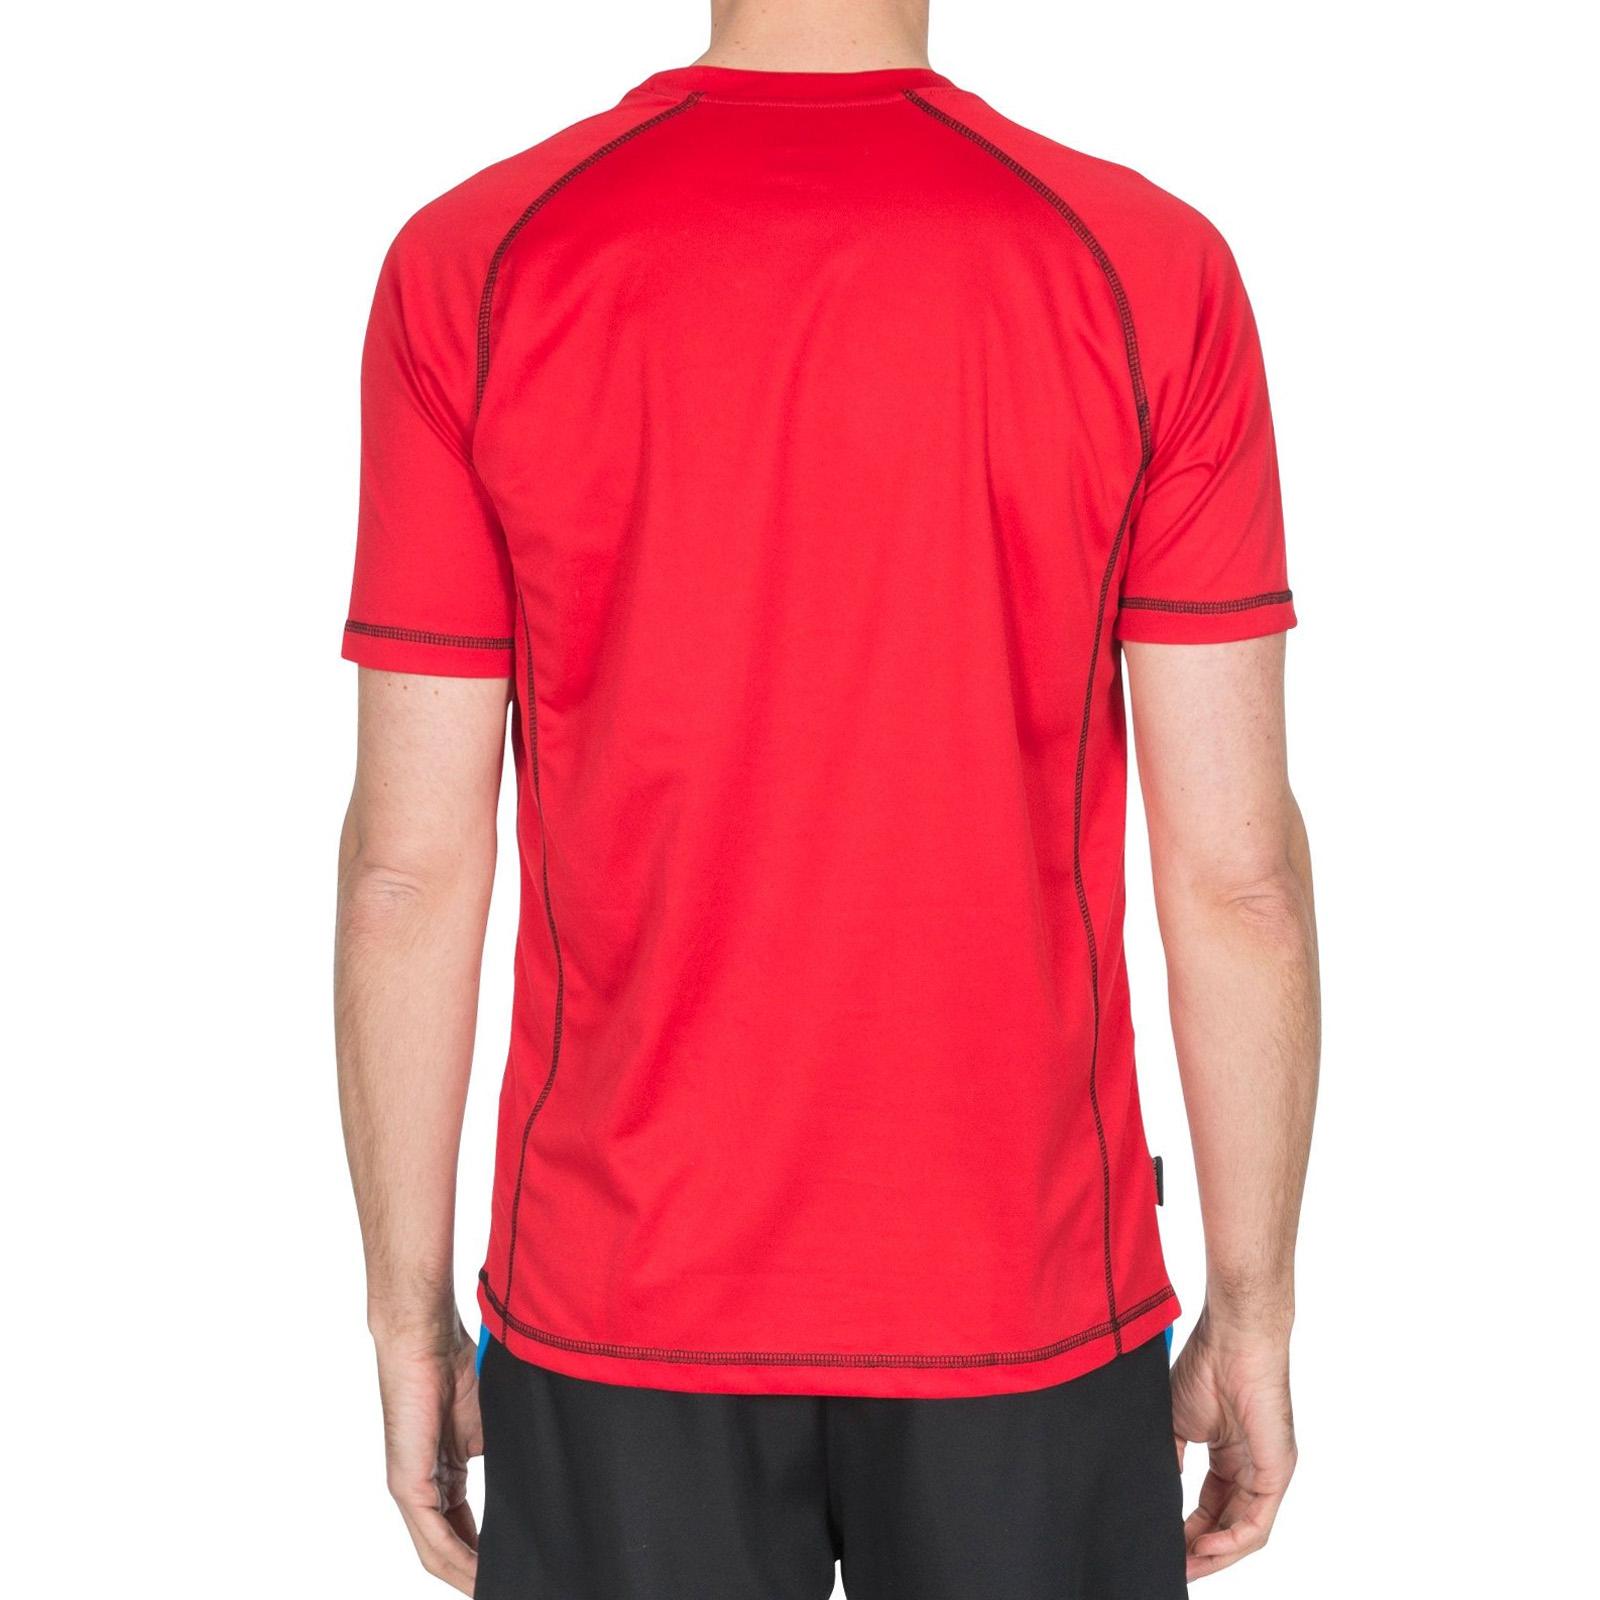 Trespass Mens Albert Crew Neck Outdoors Quick Dry Active T-Shirt Tee Top